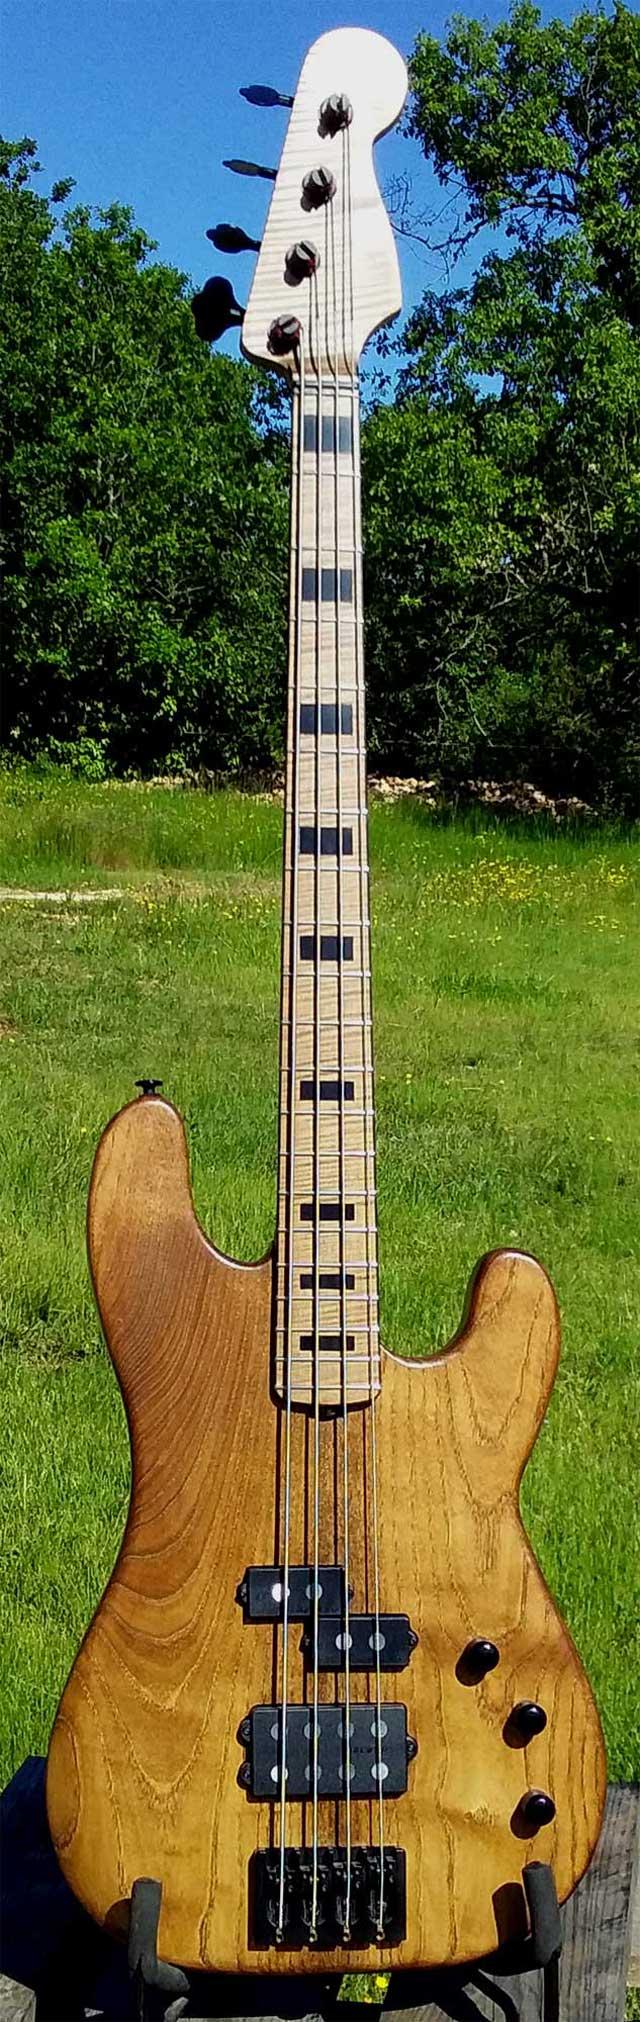 basse-electrique-sur-mesure-custom-precision